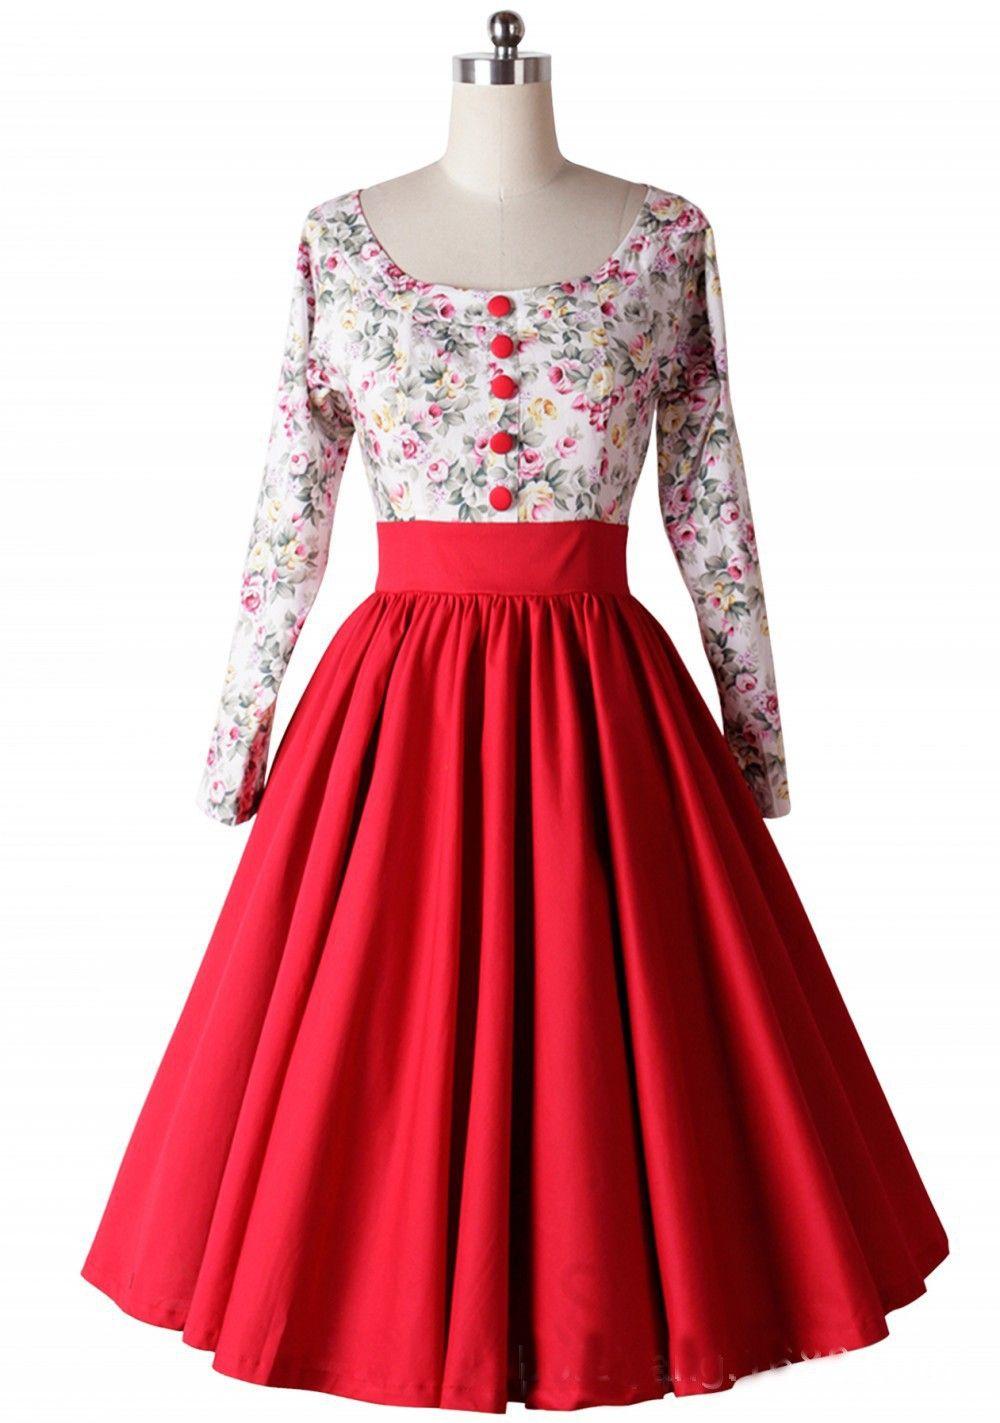 audrey hepburn style floral impression 50 s rétro robe